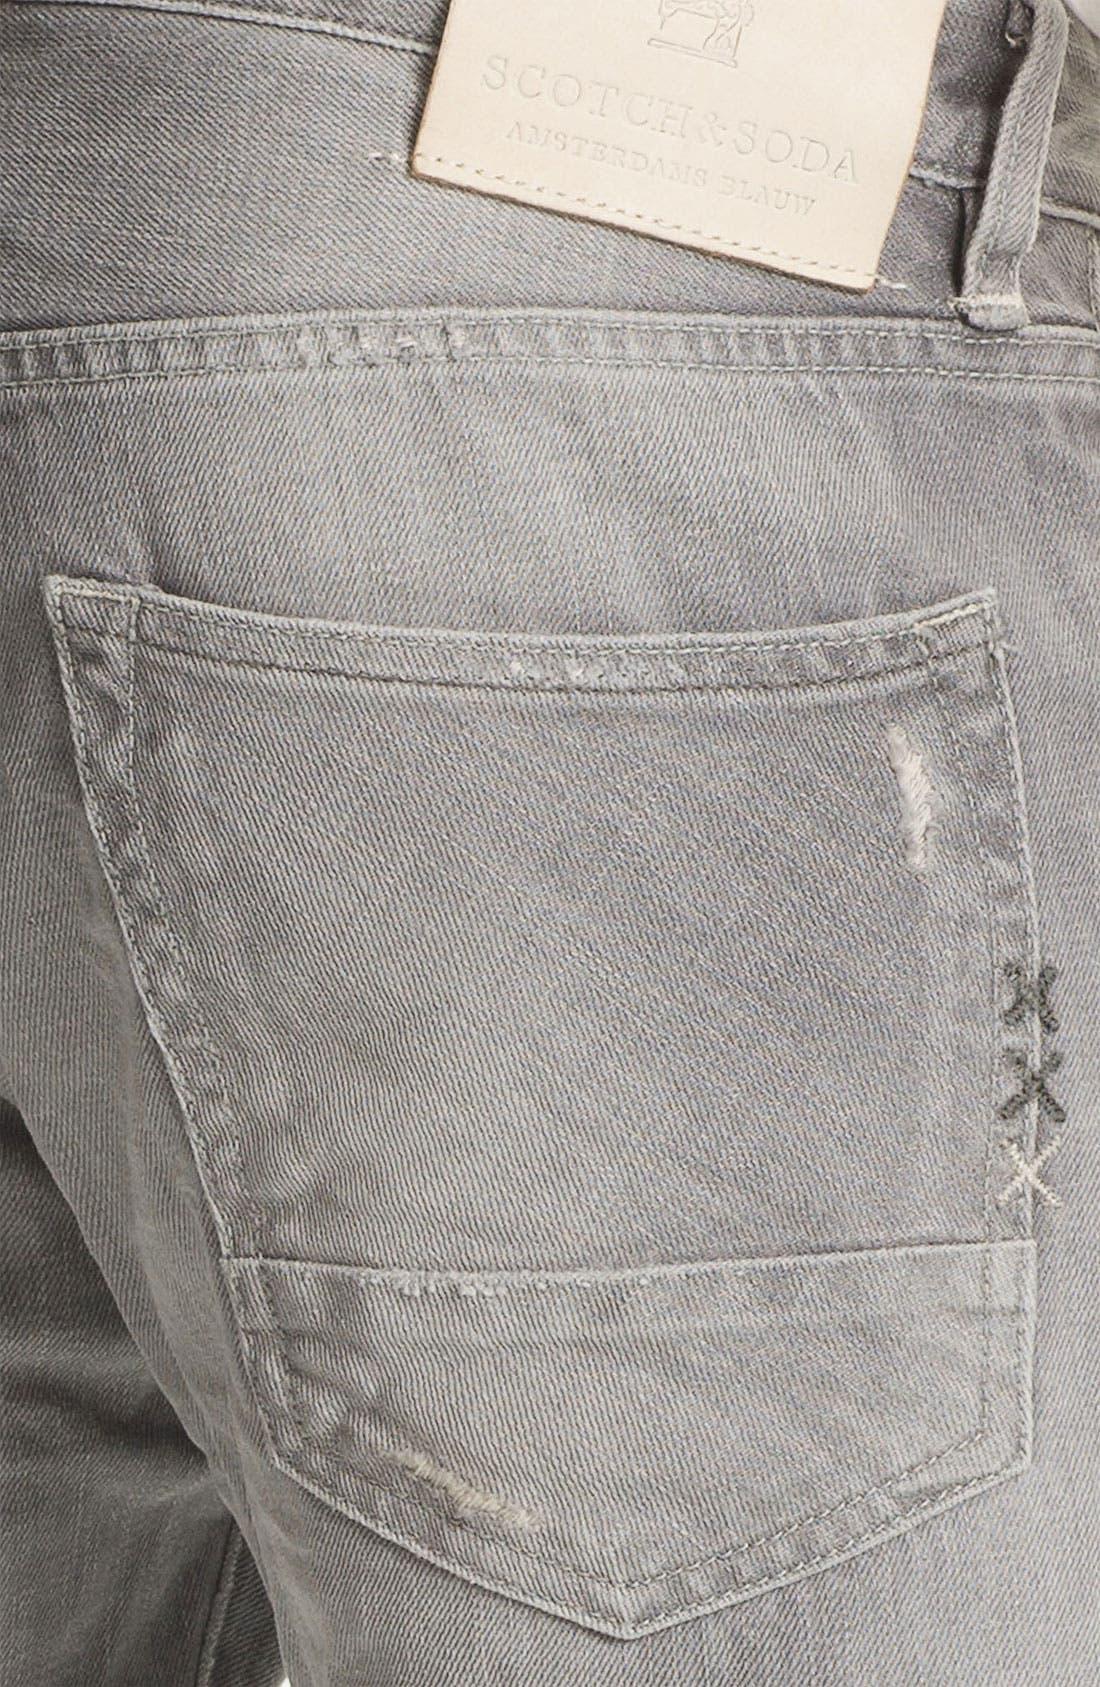 Alternate Image 4  - Scotch & Soda 'Ralston' Slim Straight Leg Jeans (Stoner)